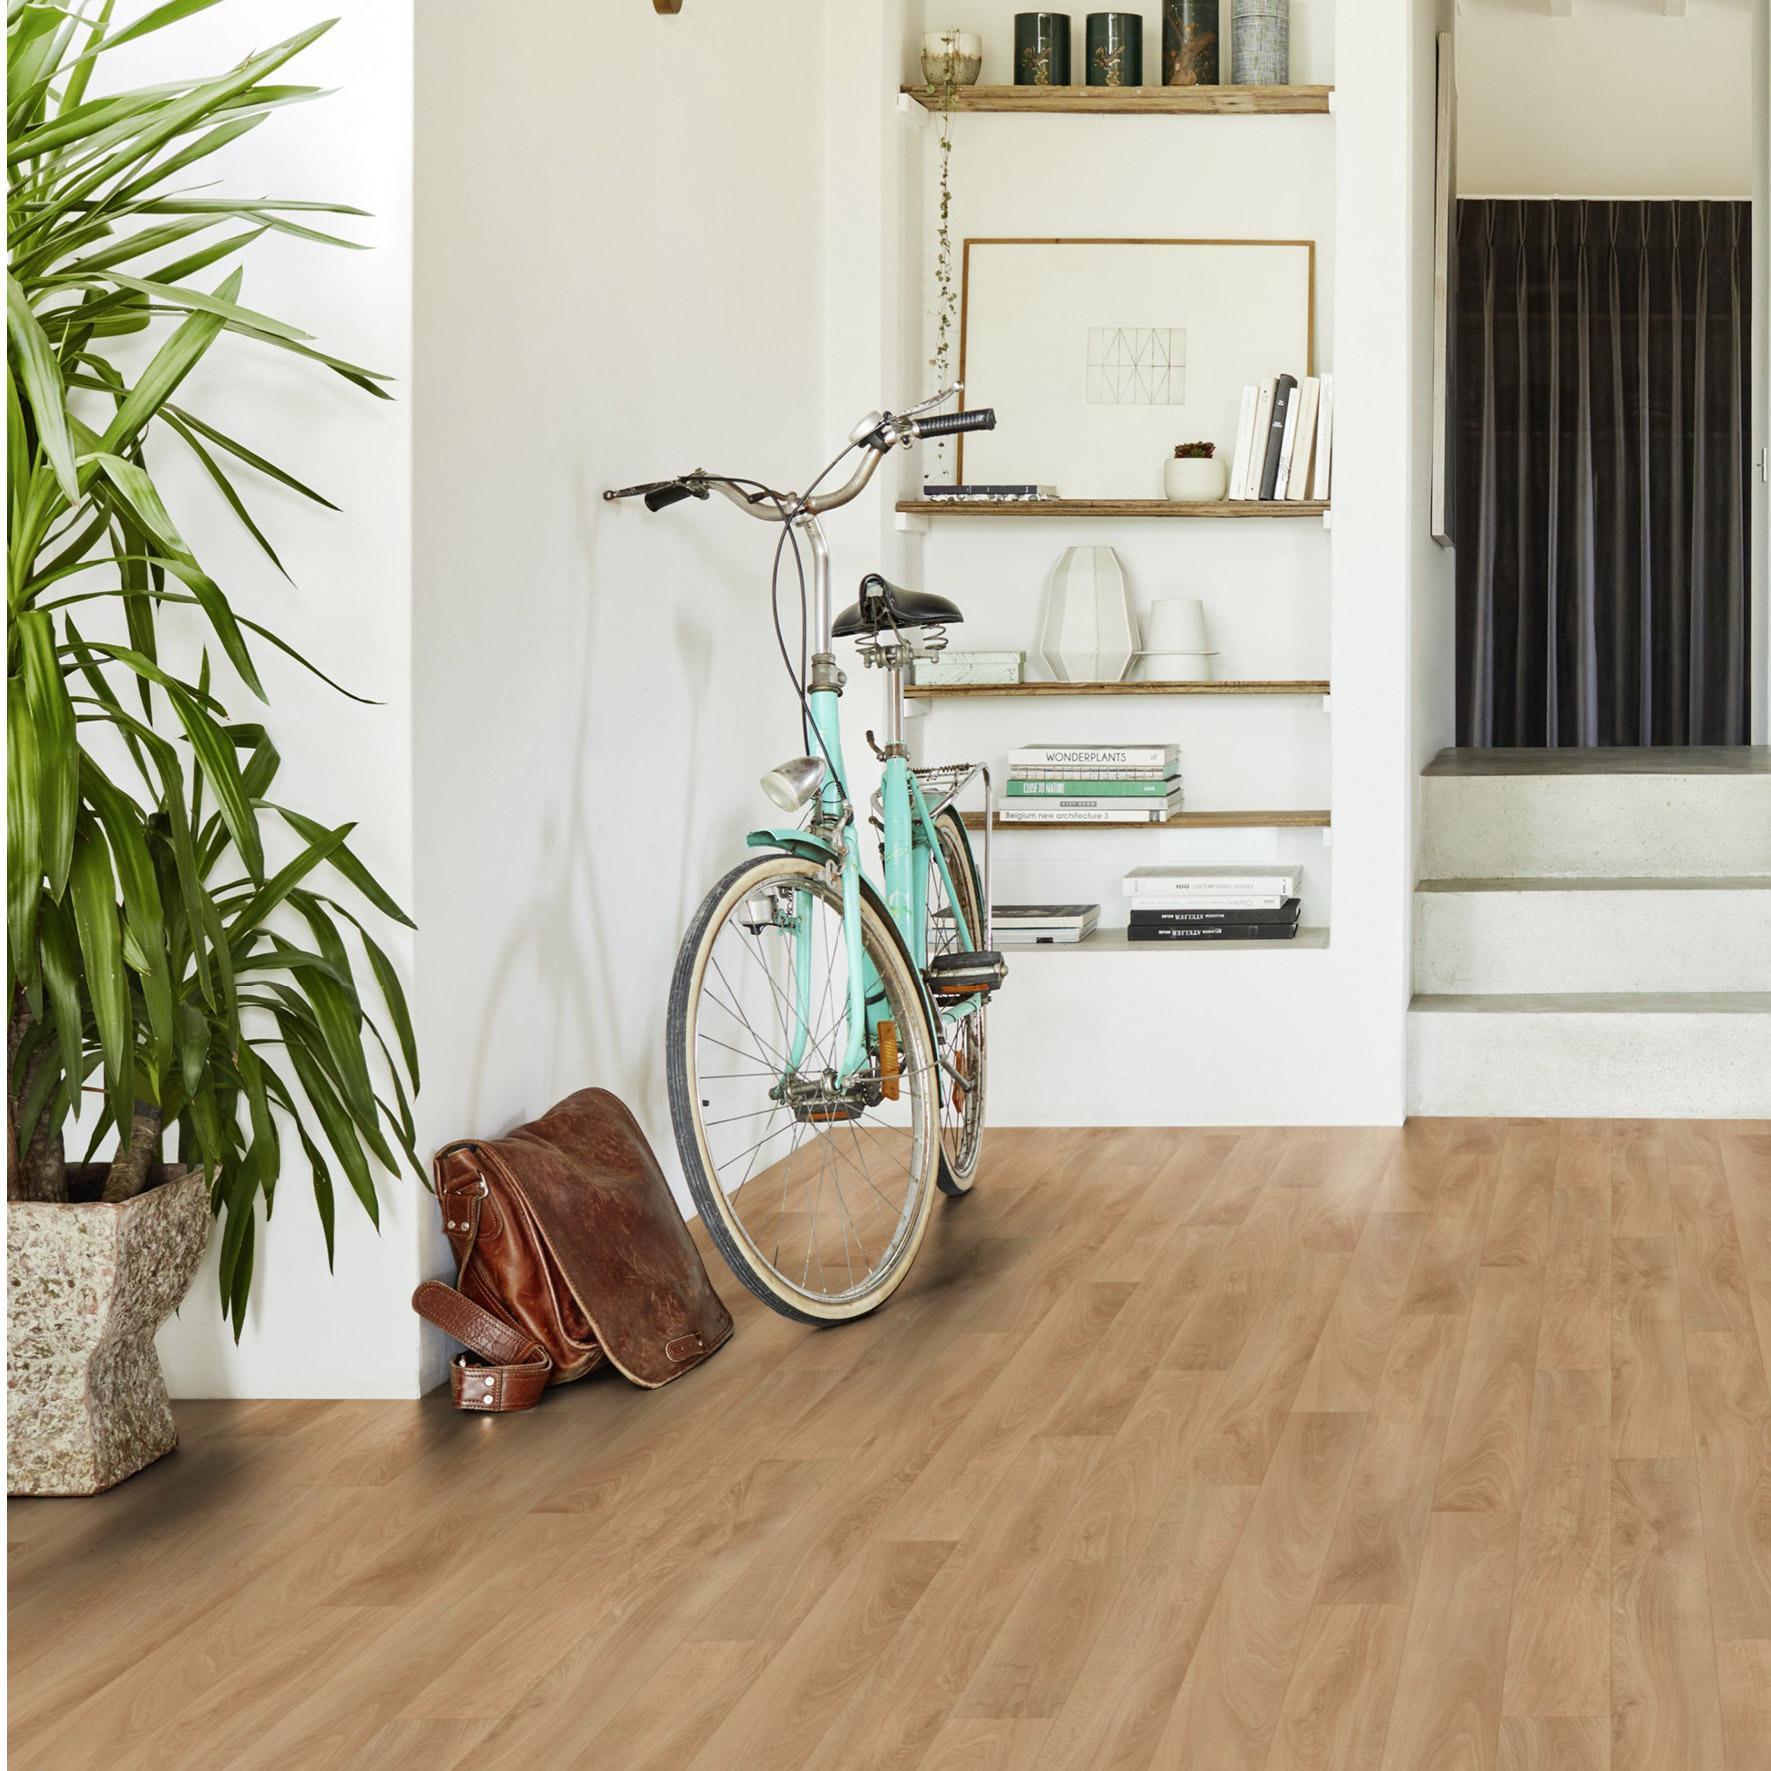 Sol PVC TARKETT effet parquet chêne beige moyen oak Intenso mousse l.9 m